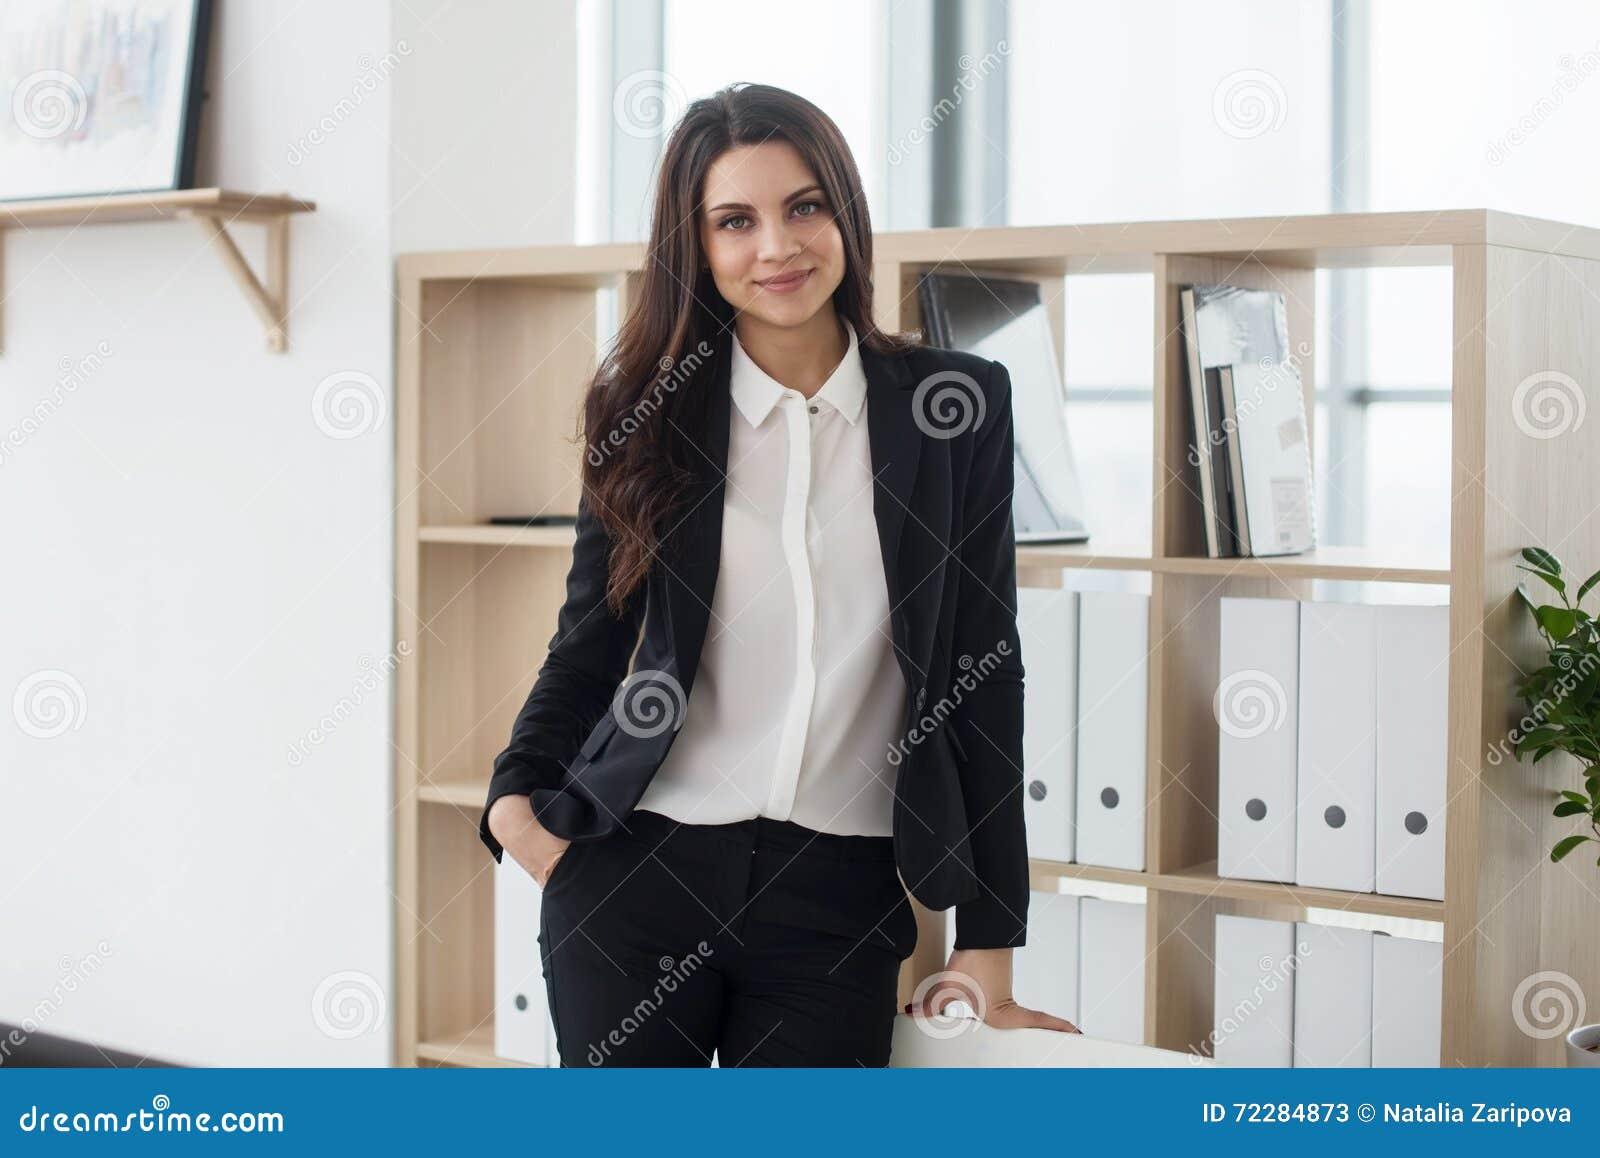 Download Бизнес-леди стоя в шкафе на офисе Стоковое Изображение - изображение насчитывающей стекло, бобра: 72284873